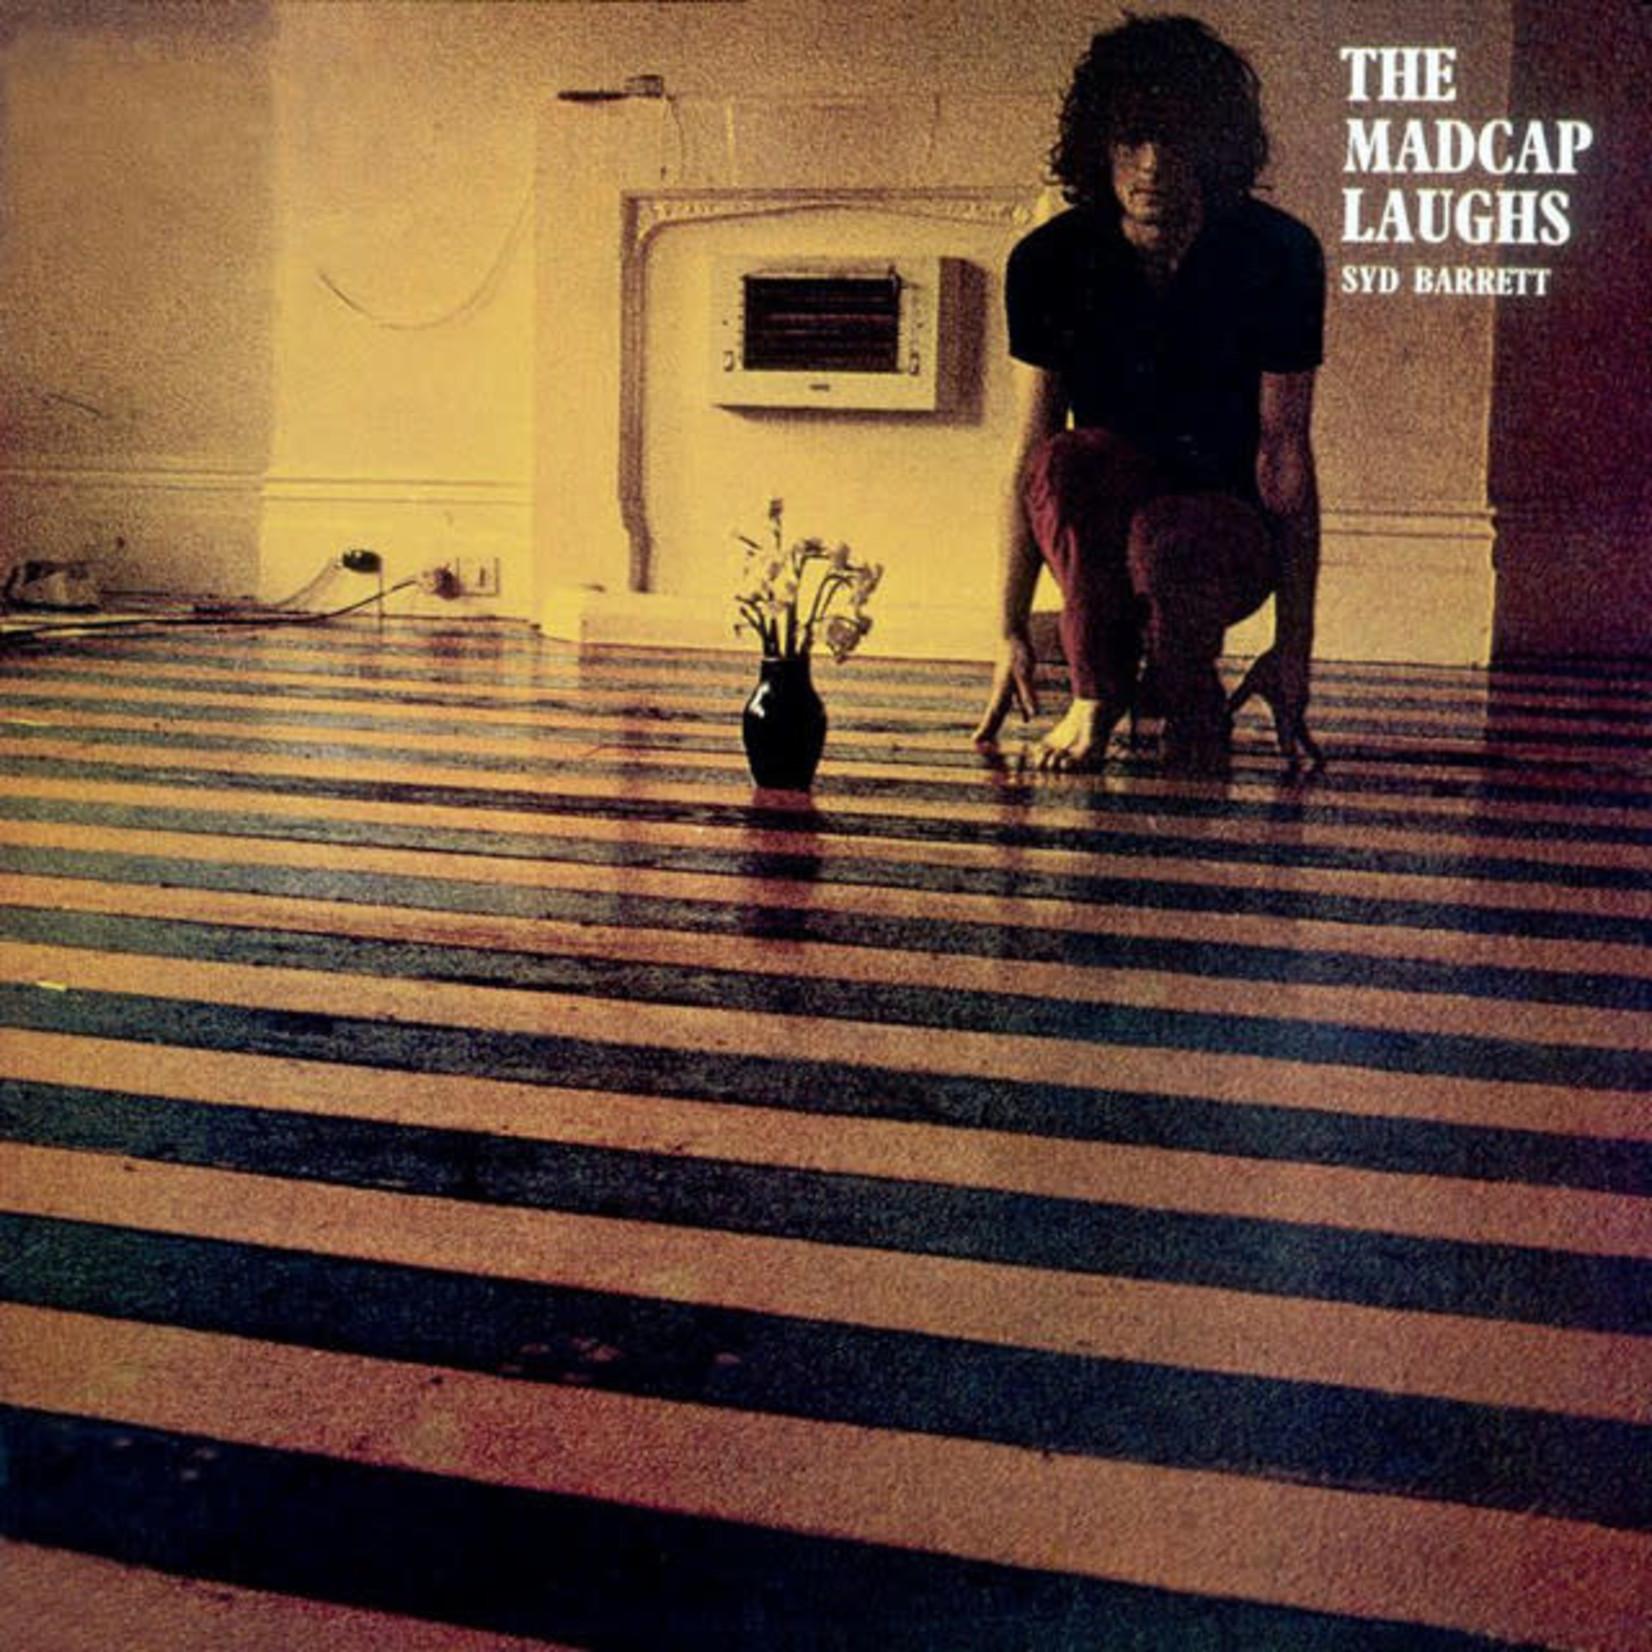 Vinyl Syd Barrett - The Madcap Laughs